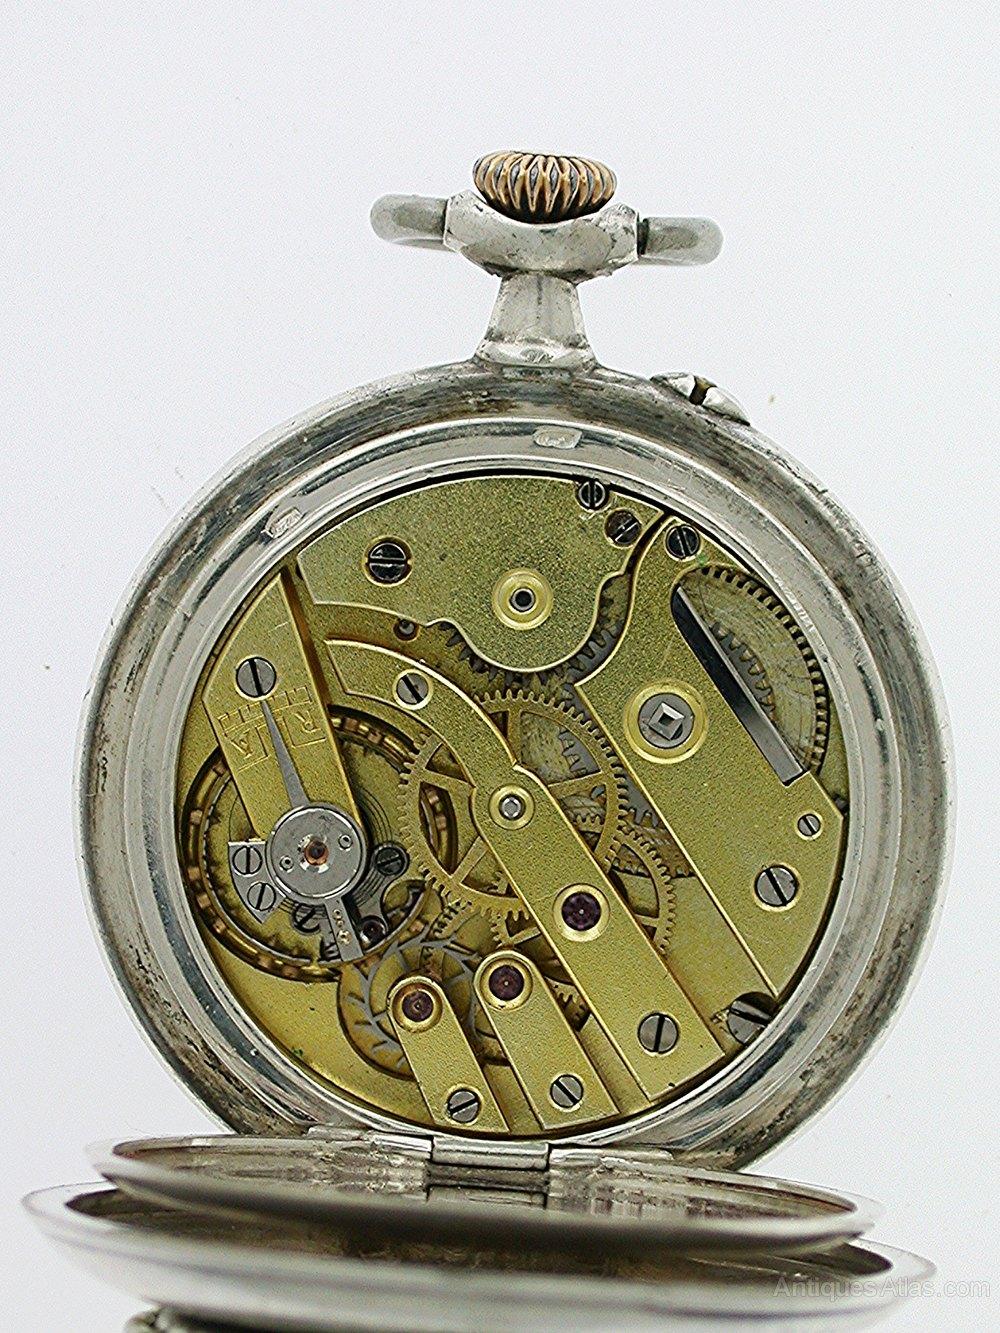 c5be88e56 Unique Silver 0.800 Open Face FOB Pocket Watch LeCoultre Antique and  Vintage Pocket Watches %%alt5%% ...